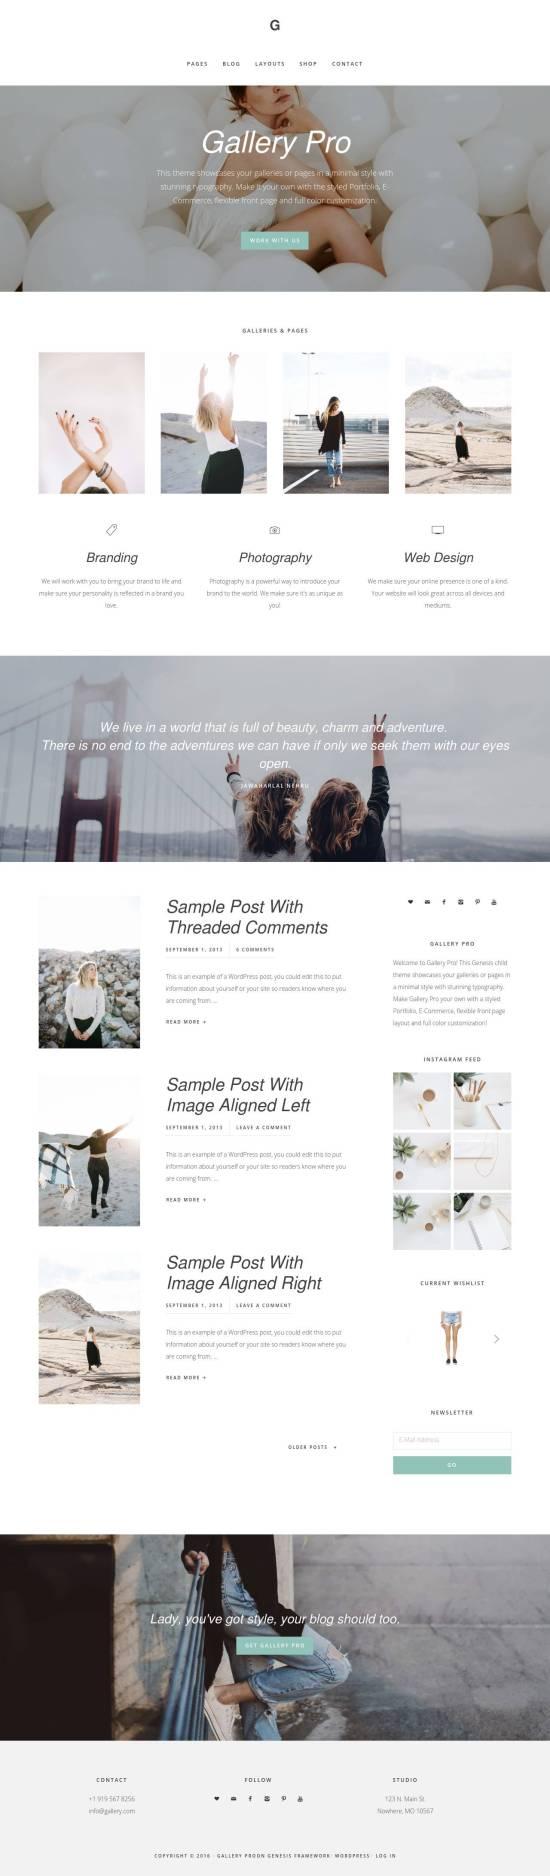 gallery pro studiopress wordpress theme 01 550x1876 - Gallery PRO WordPress Theme